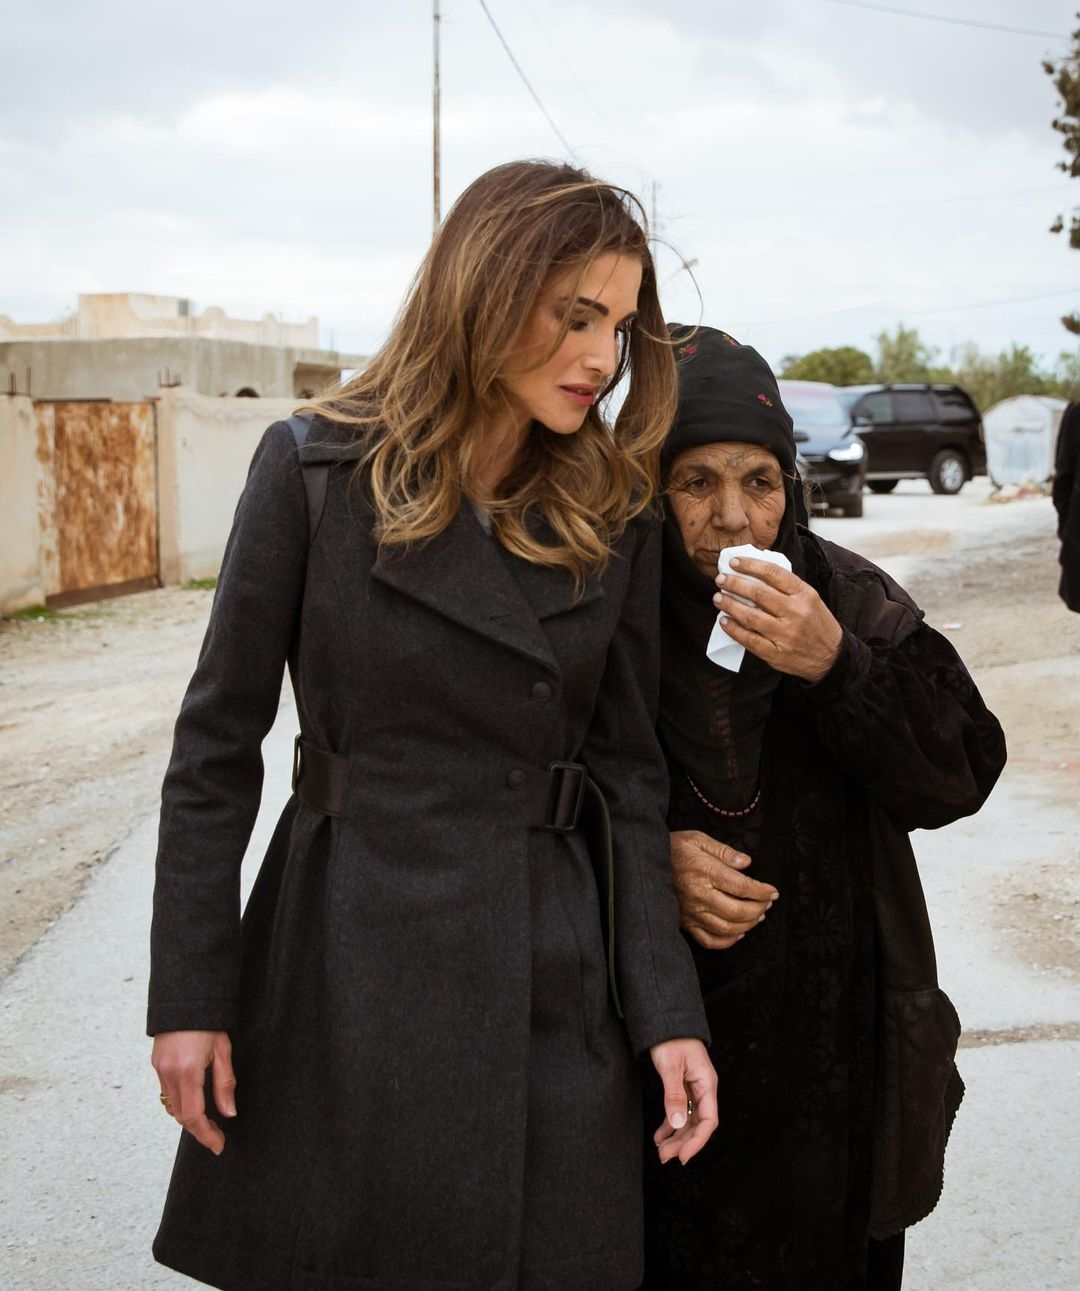 7 Inspiring Quotes By Jordan's Queen Rania